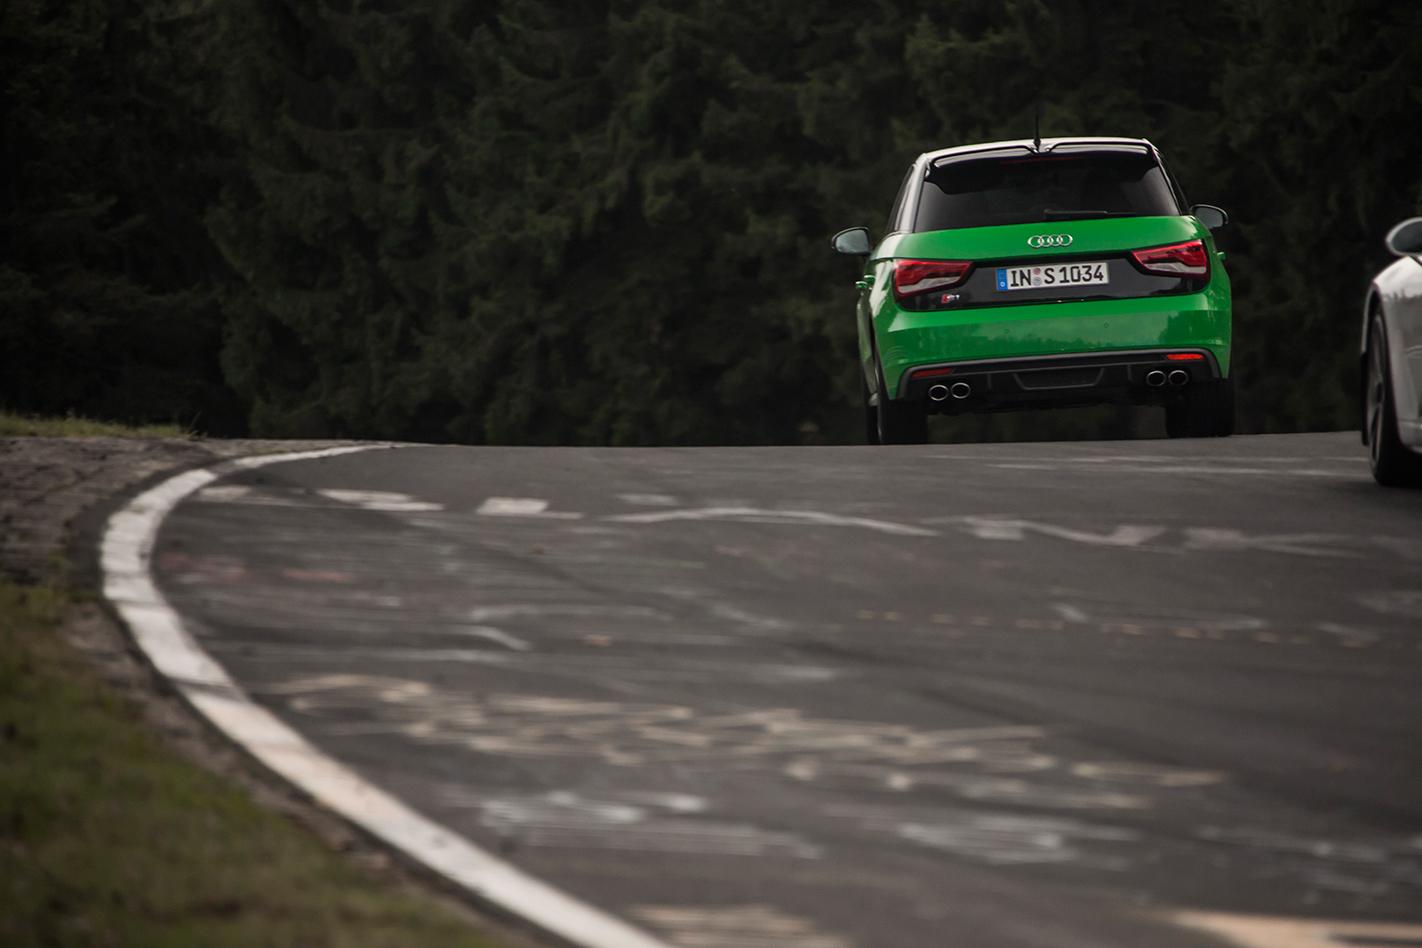 Audi S1 at the Nurburgring